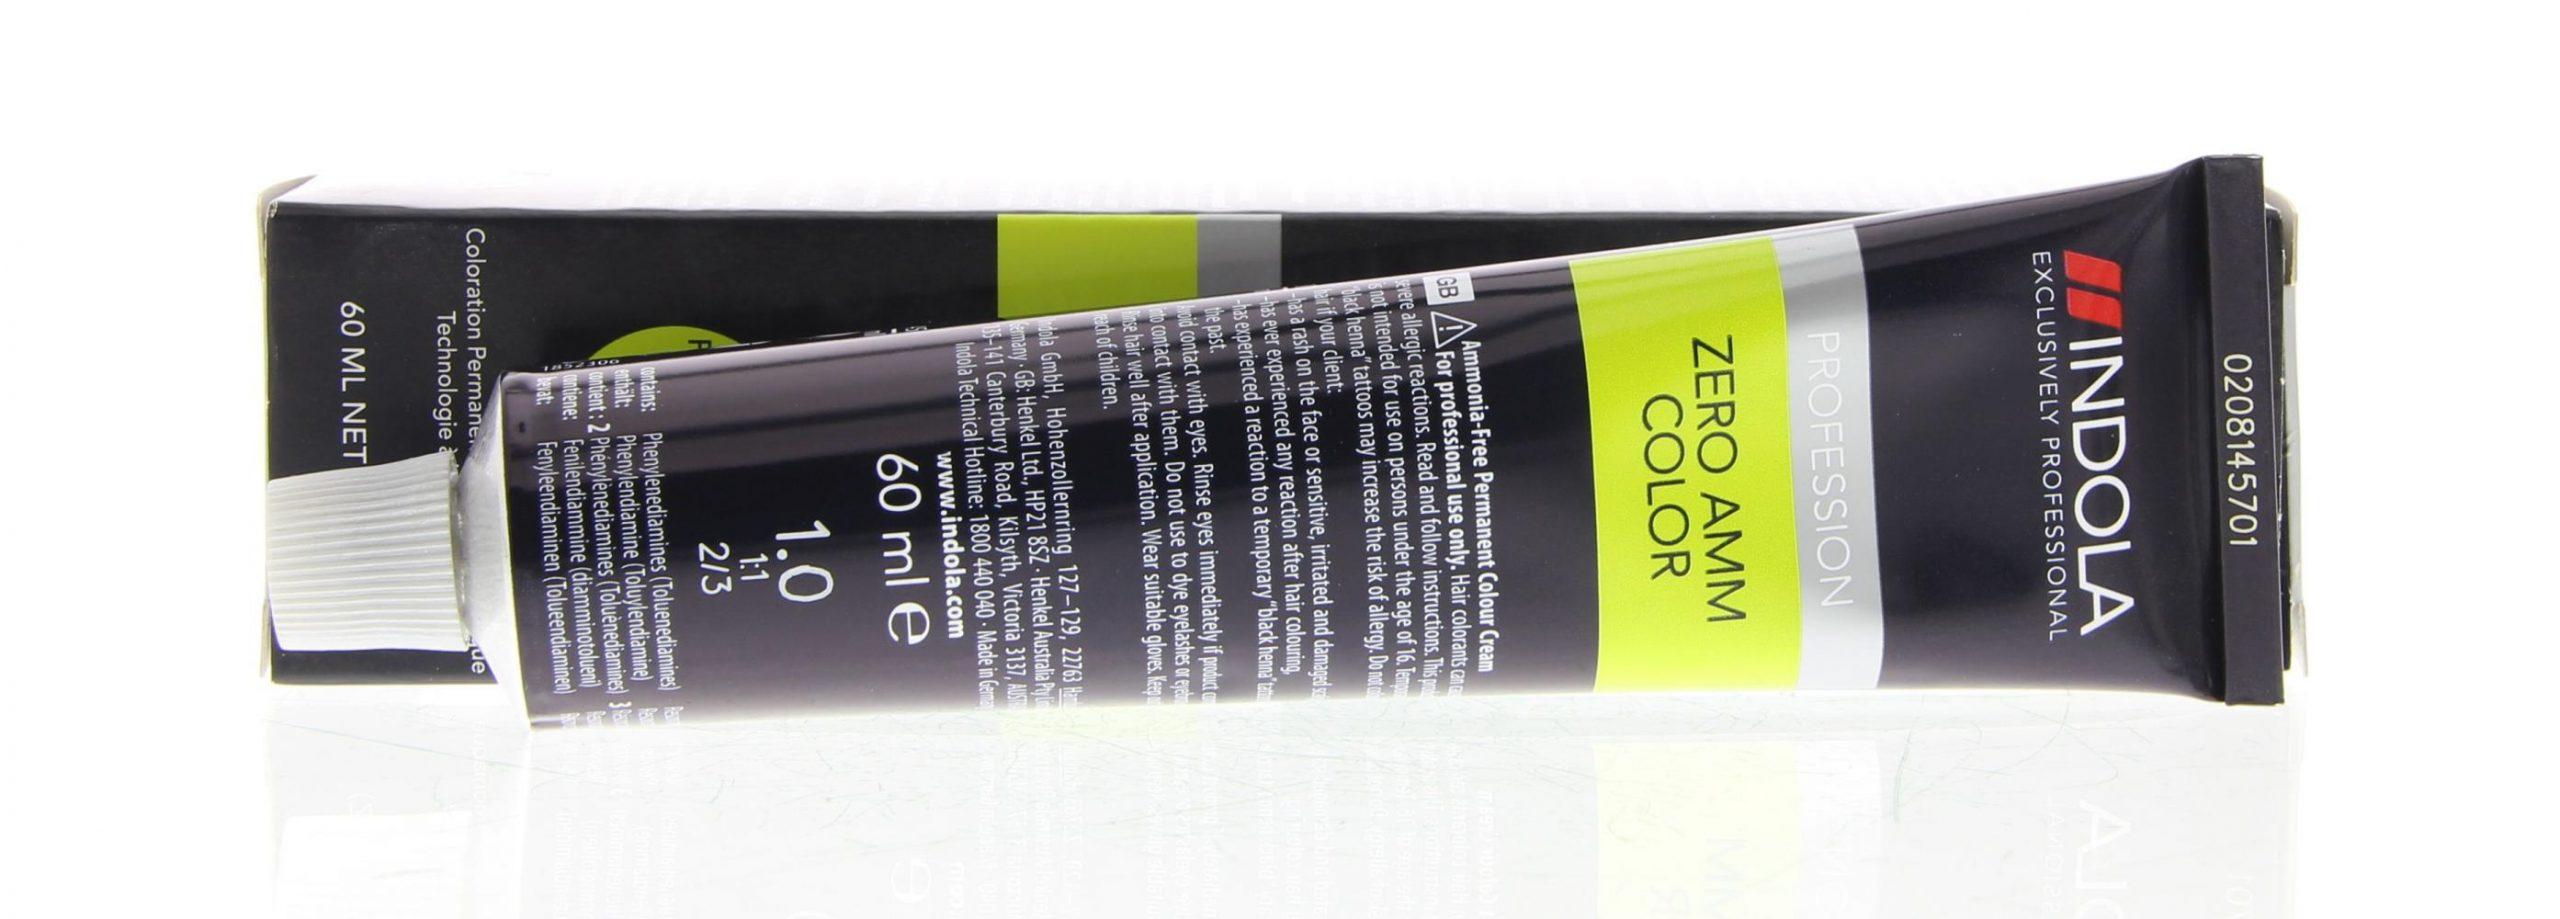 Indola Profession Zero Amm Color No Ammonia Permanent Color Haarverf 6.82  60ml